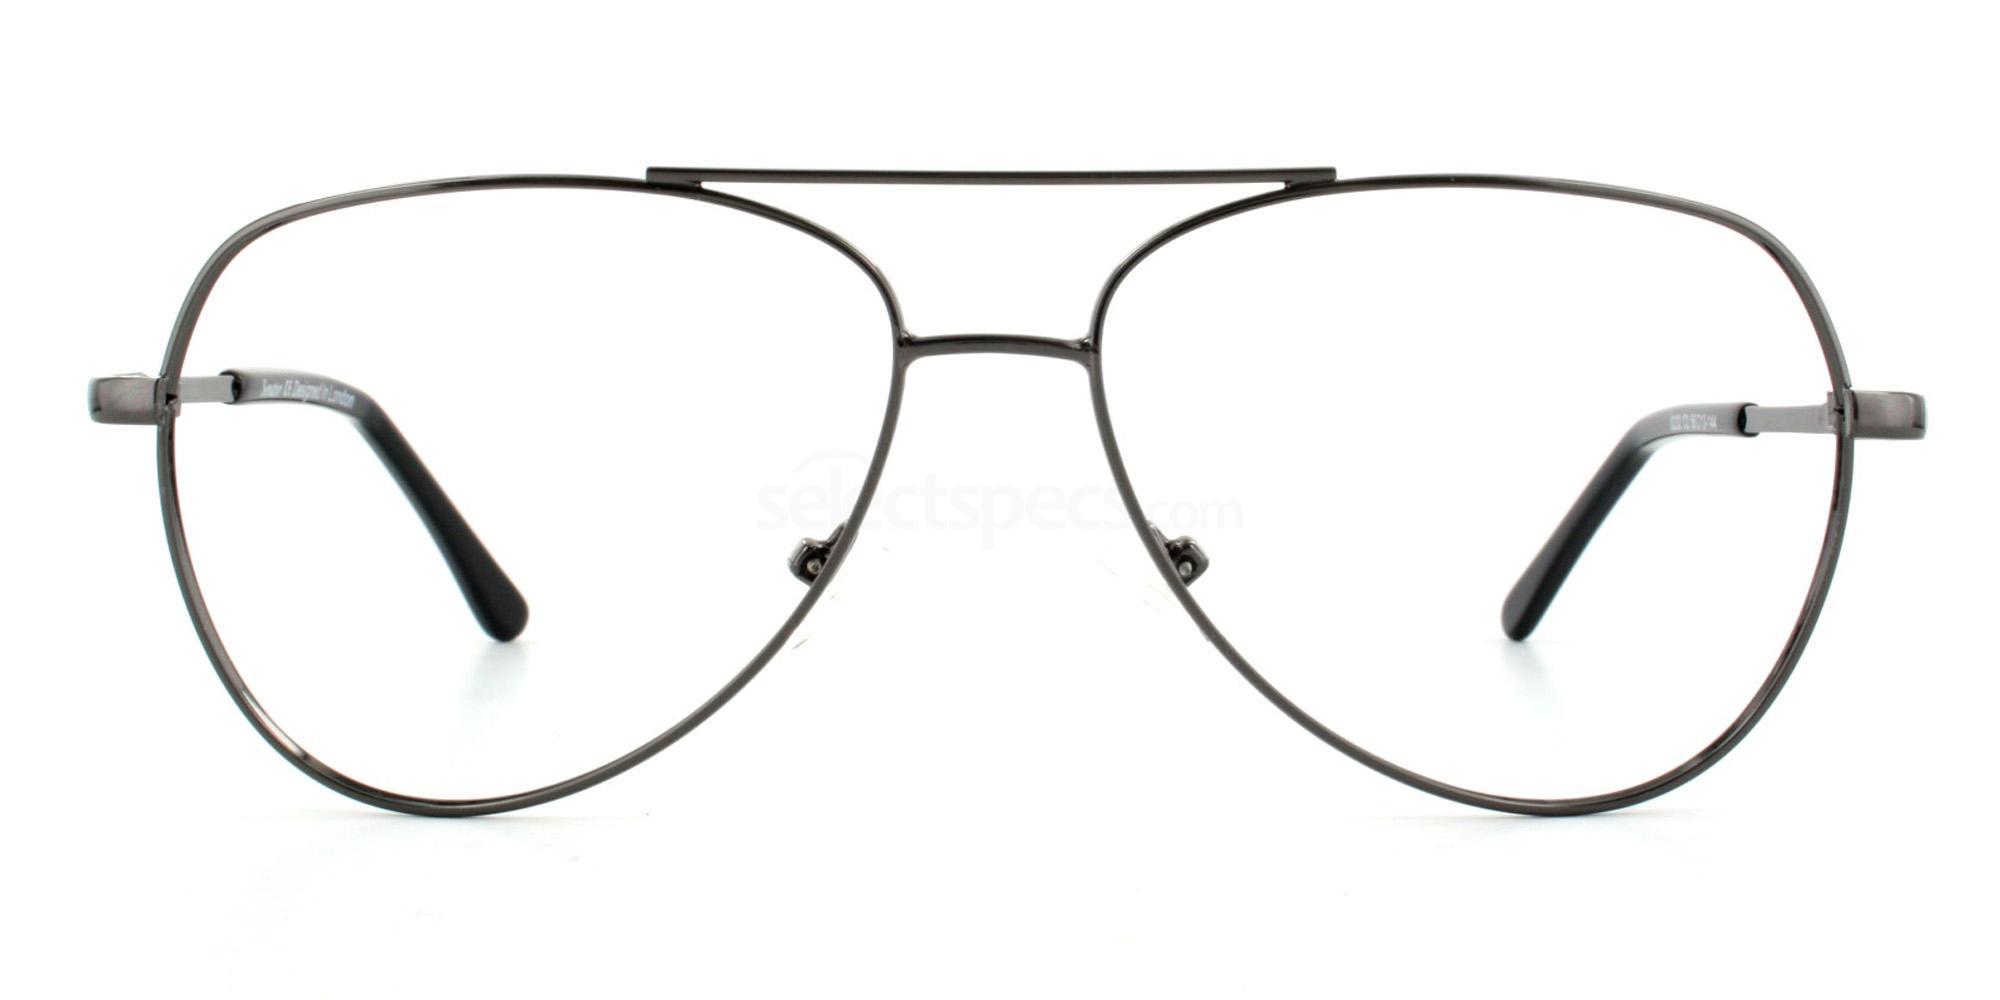 C2 SENATOR 232 Glasses, Senator